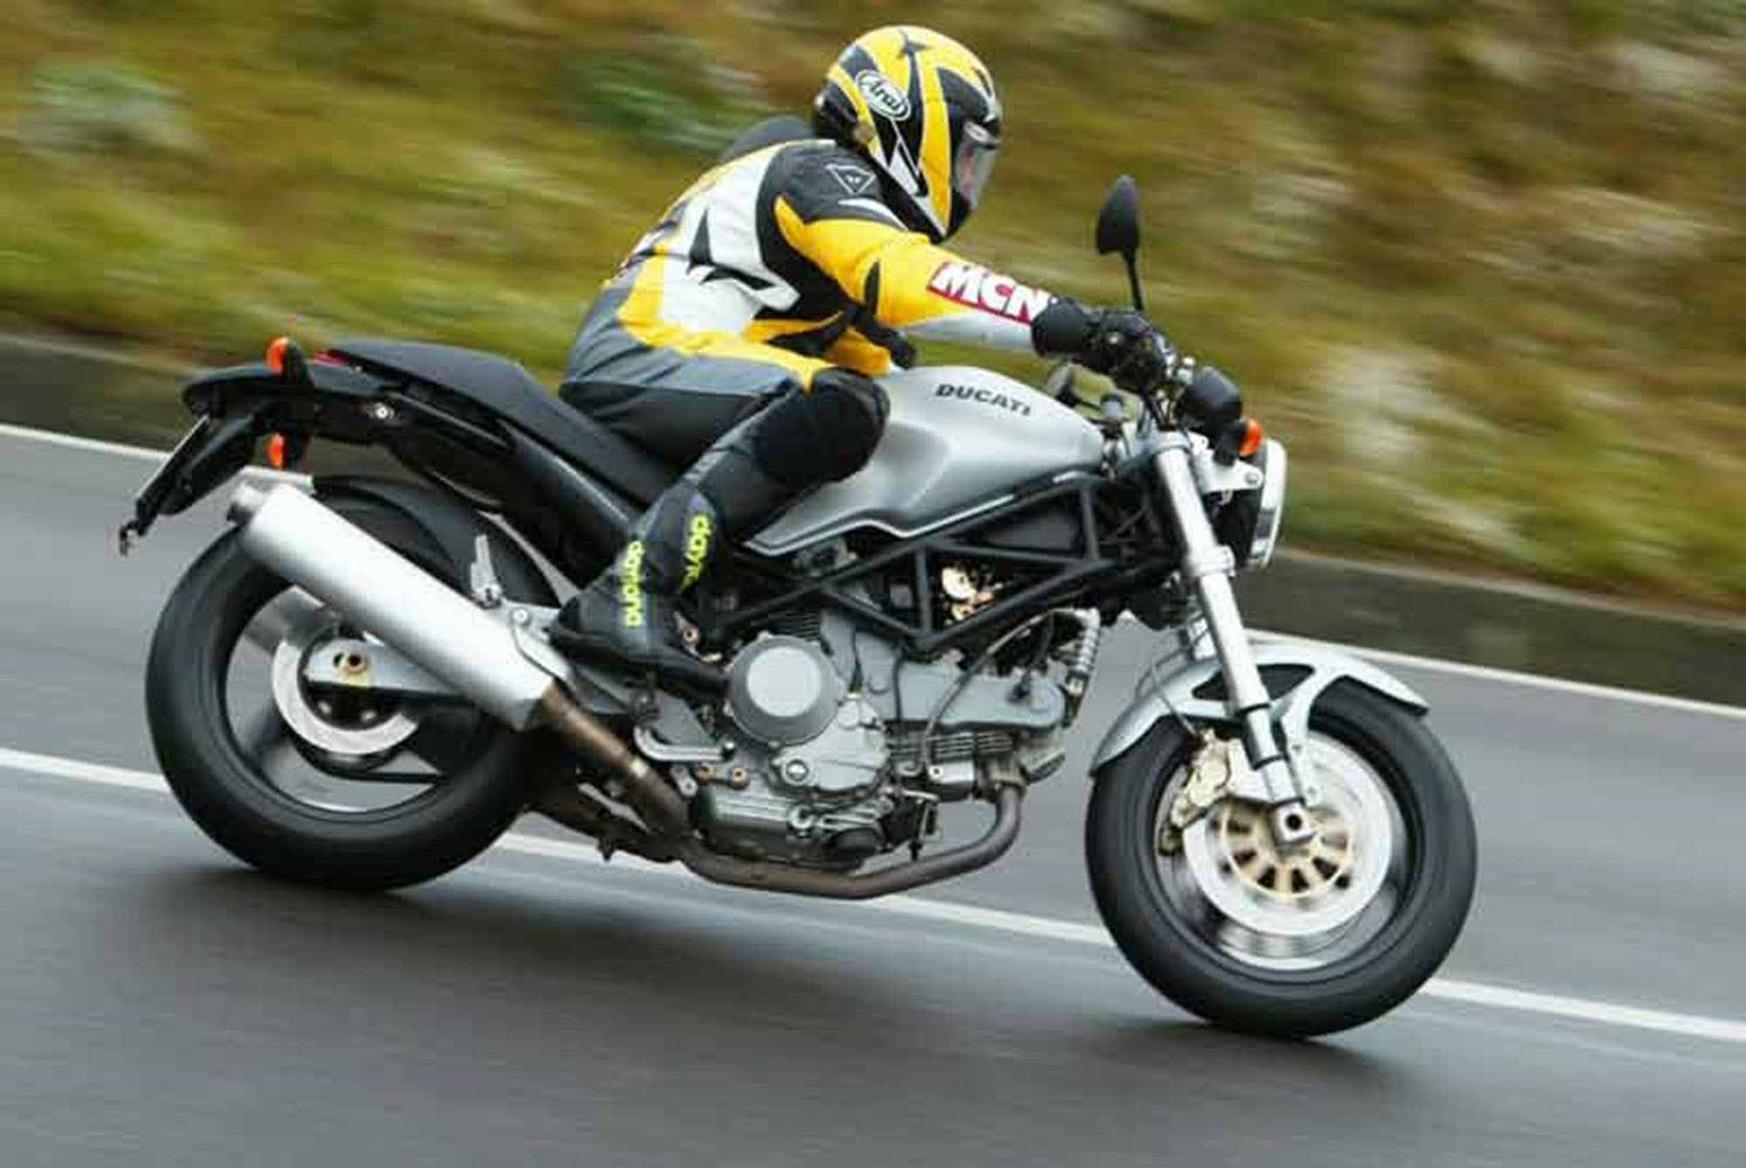 Ducati Monster M1000